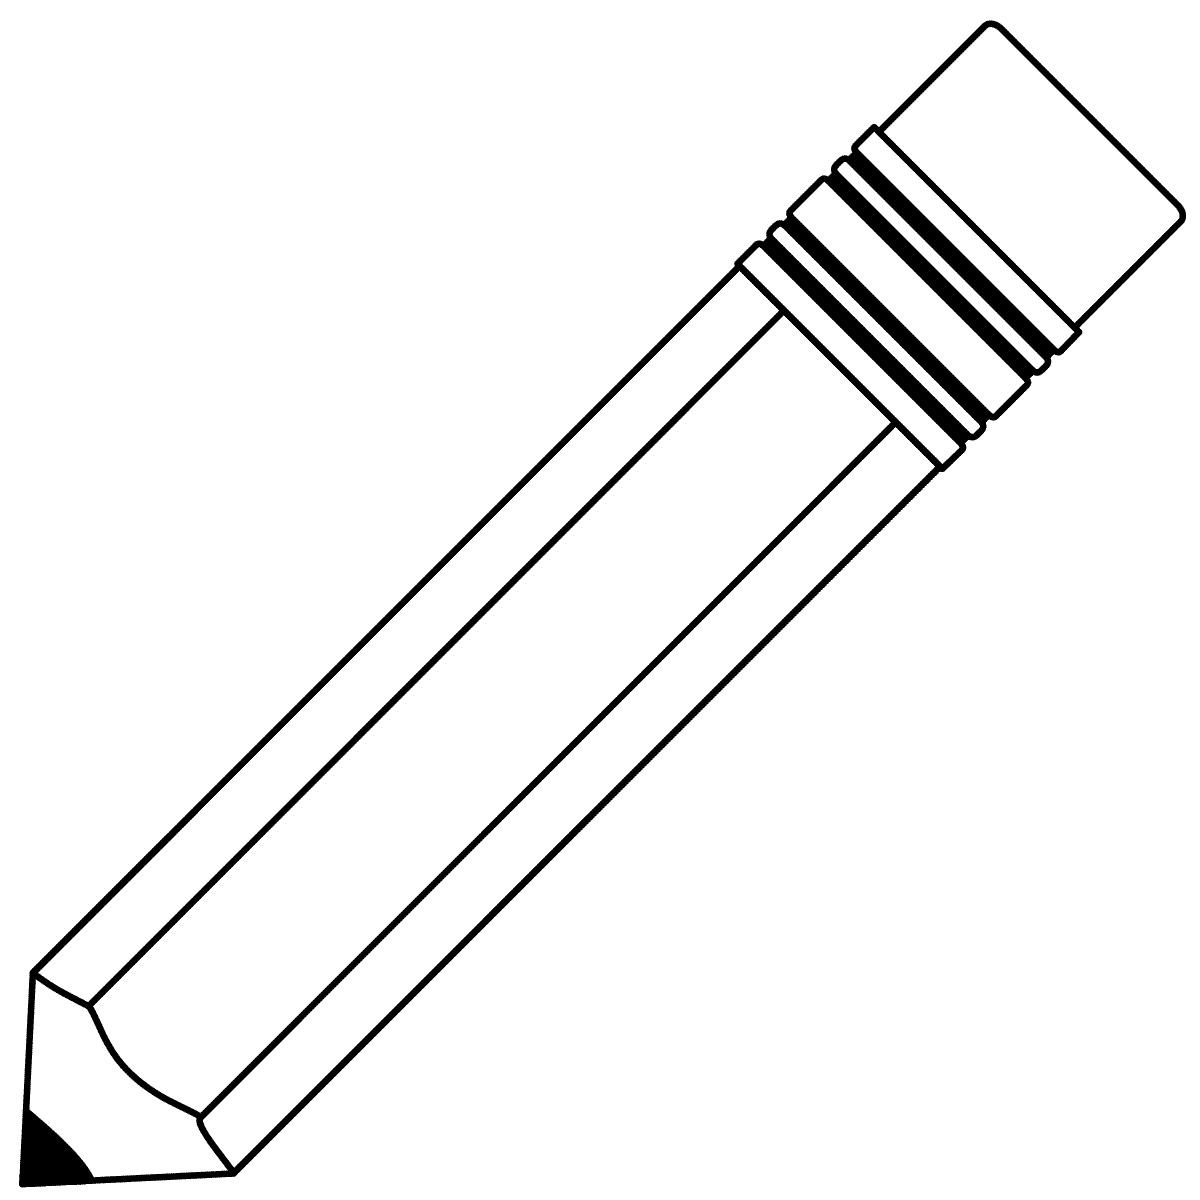 Free Pencil Line Art Download Free Clip Art Free Clip